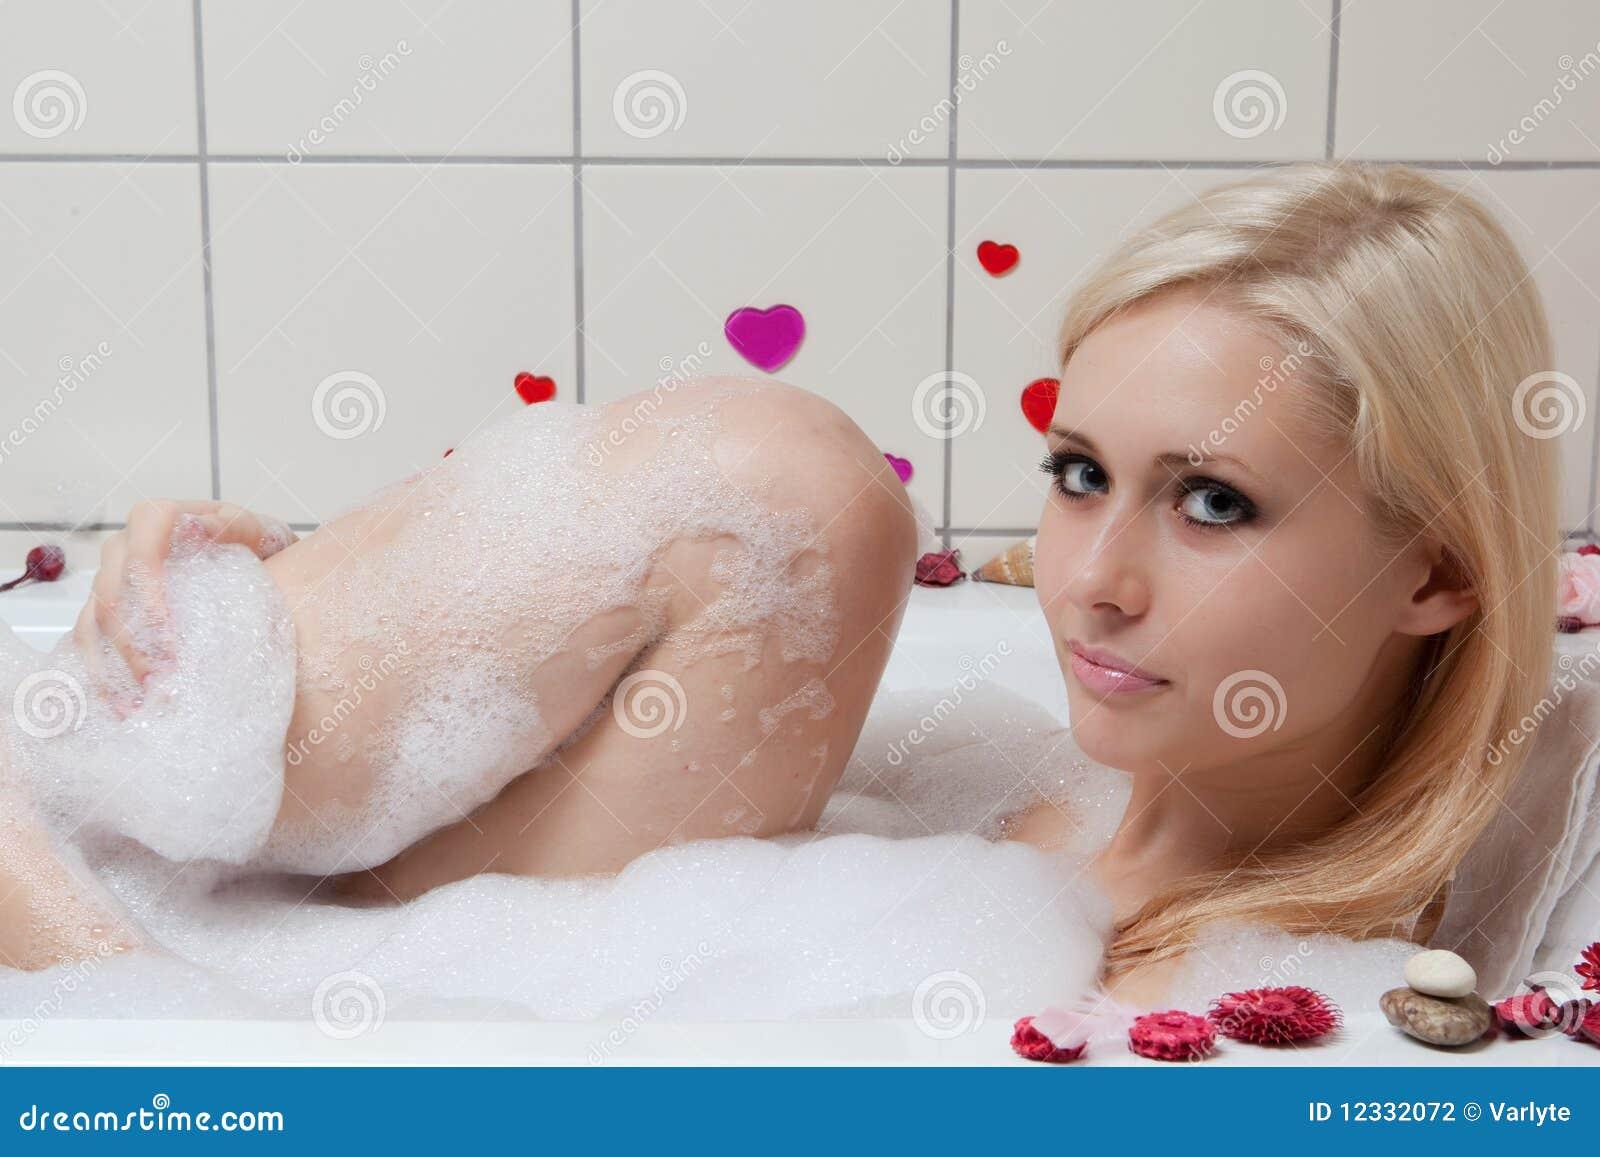 Bathing videos cumshot picture 87